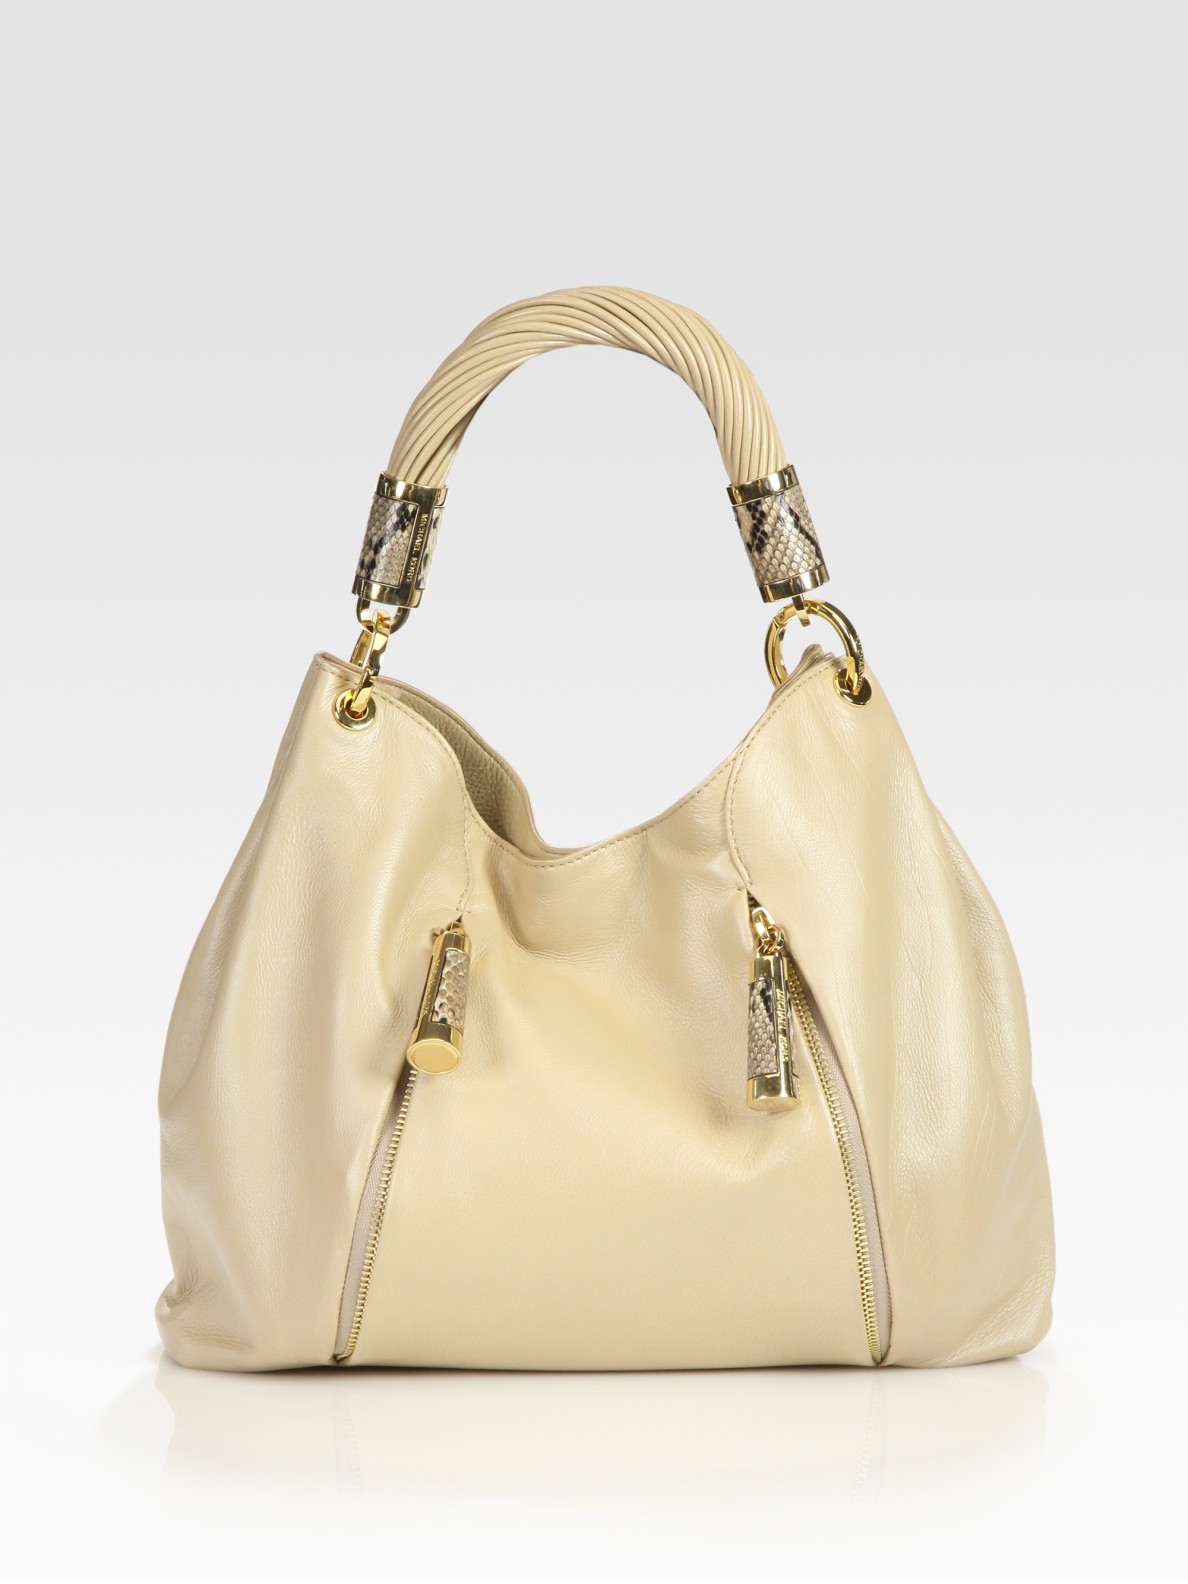 Discount Michael Kors Tonne Hobo - Bags Michael Kors Tonne Hobo Bag Beige